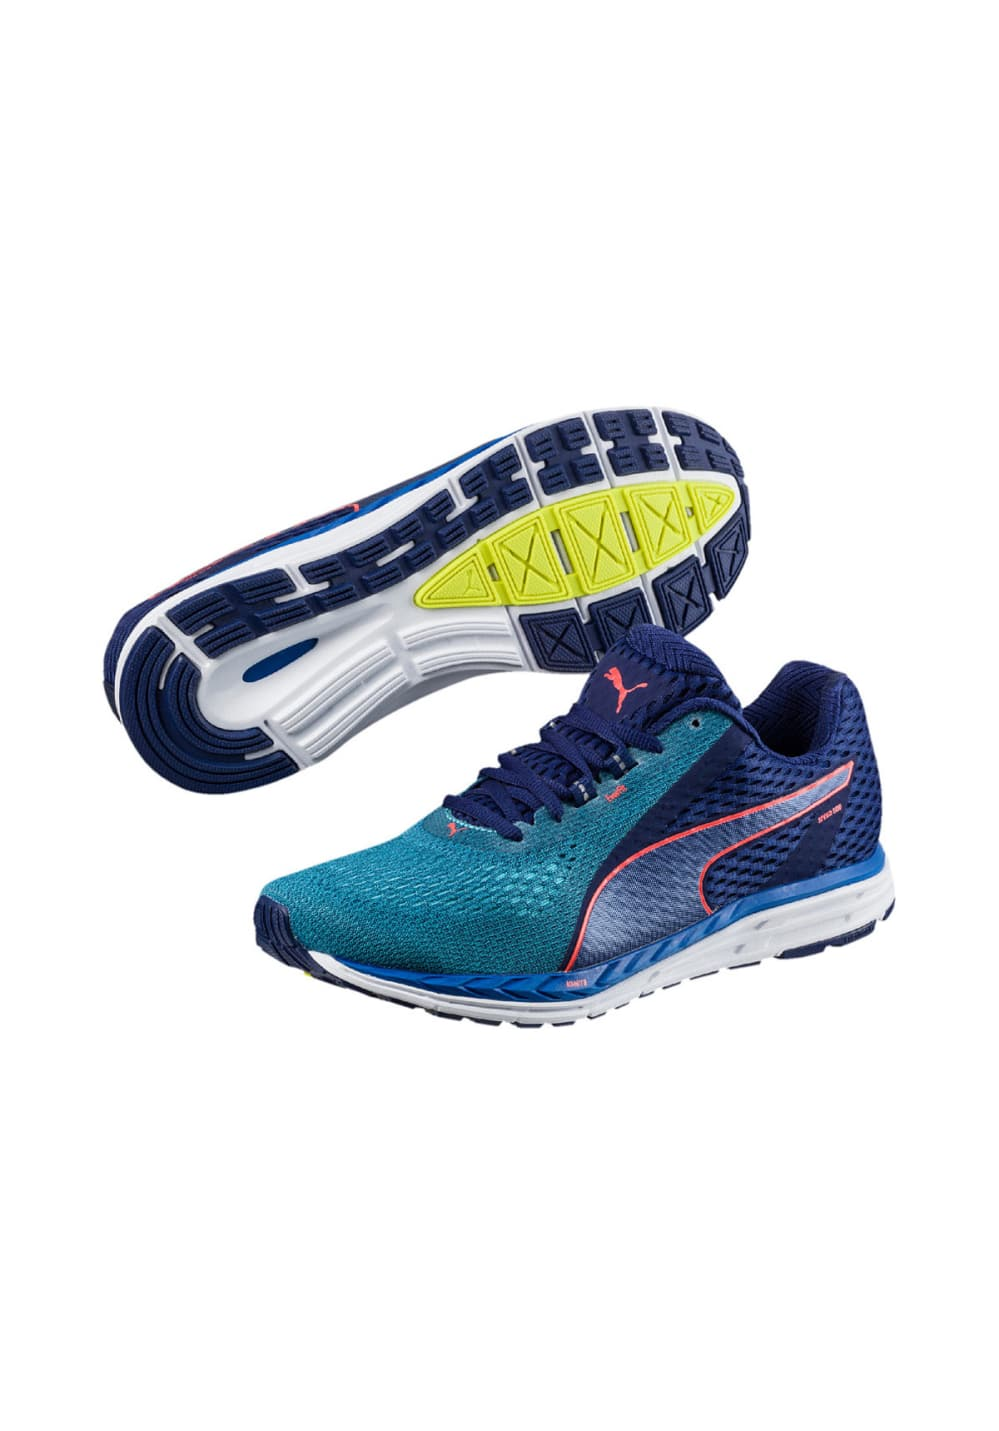 San Francisco 72826 78c12 Puma Speed 500 Ignite 2 - Running shoes for Men - Blue